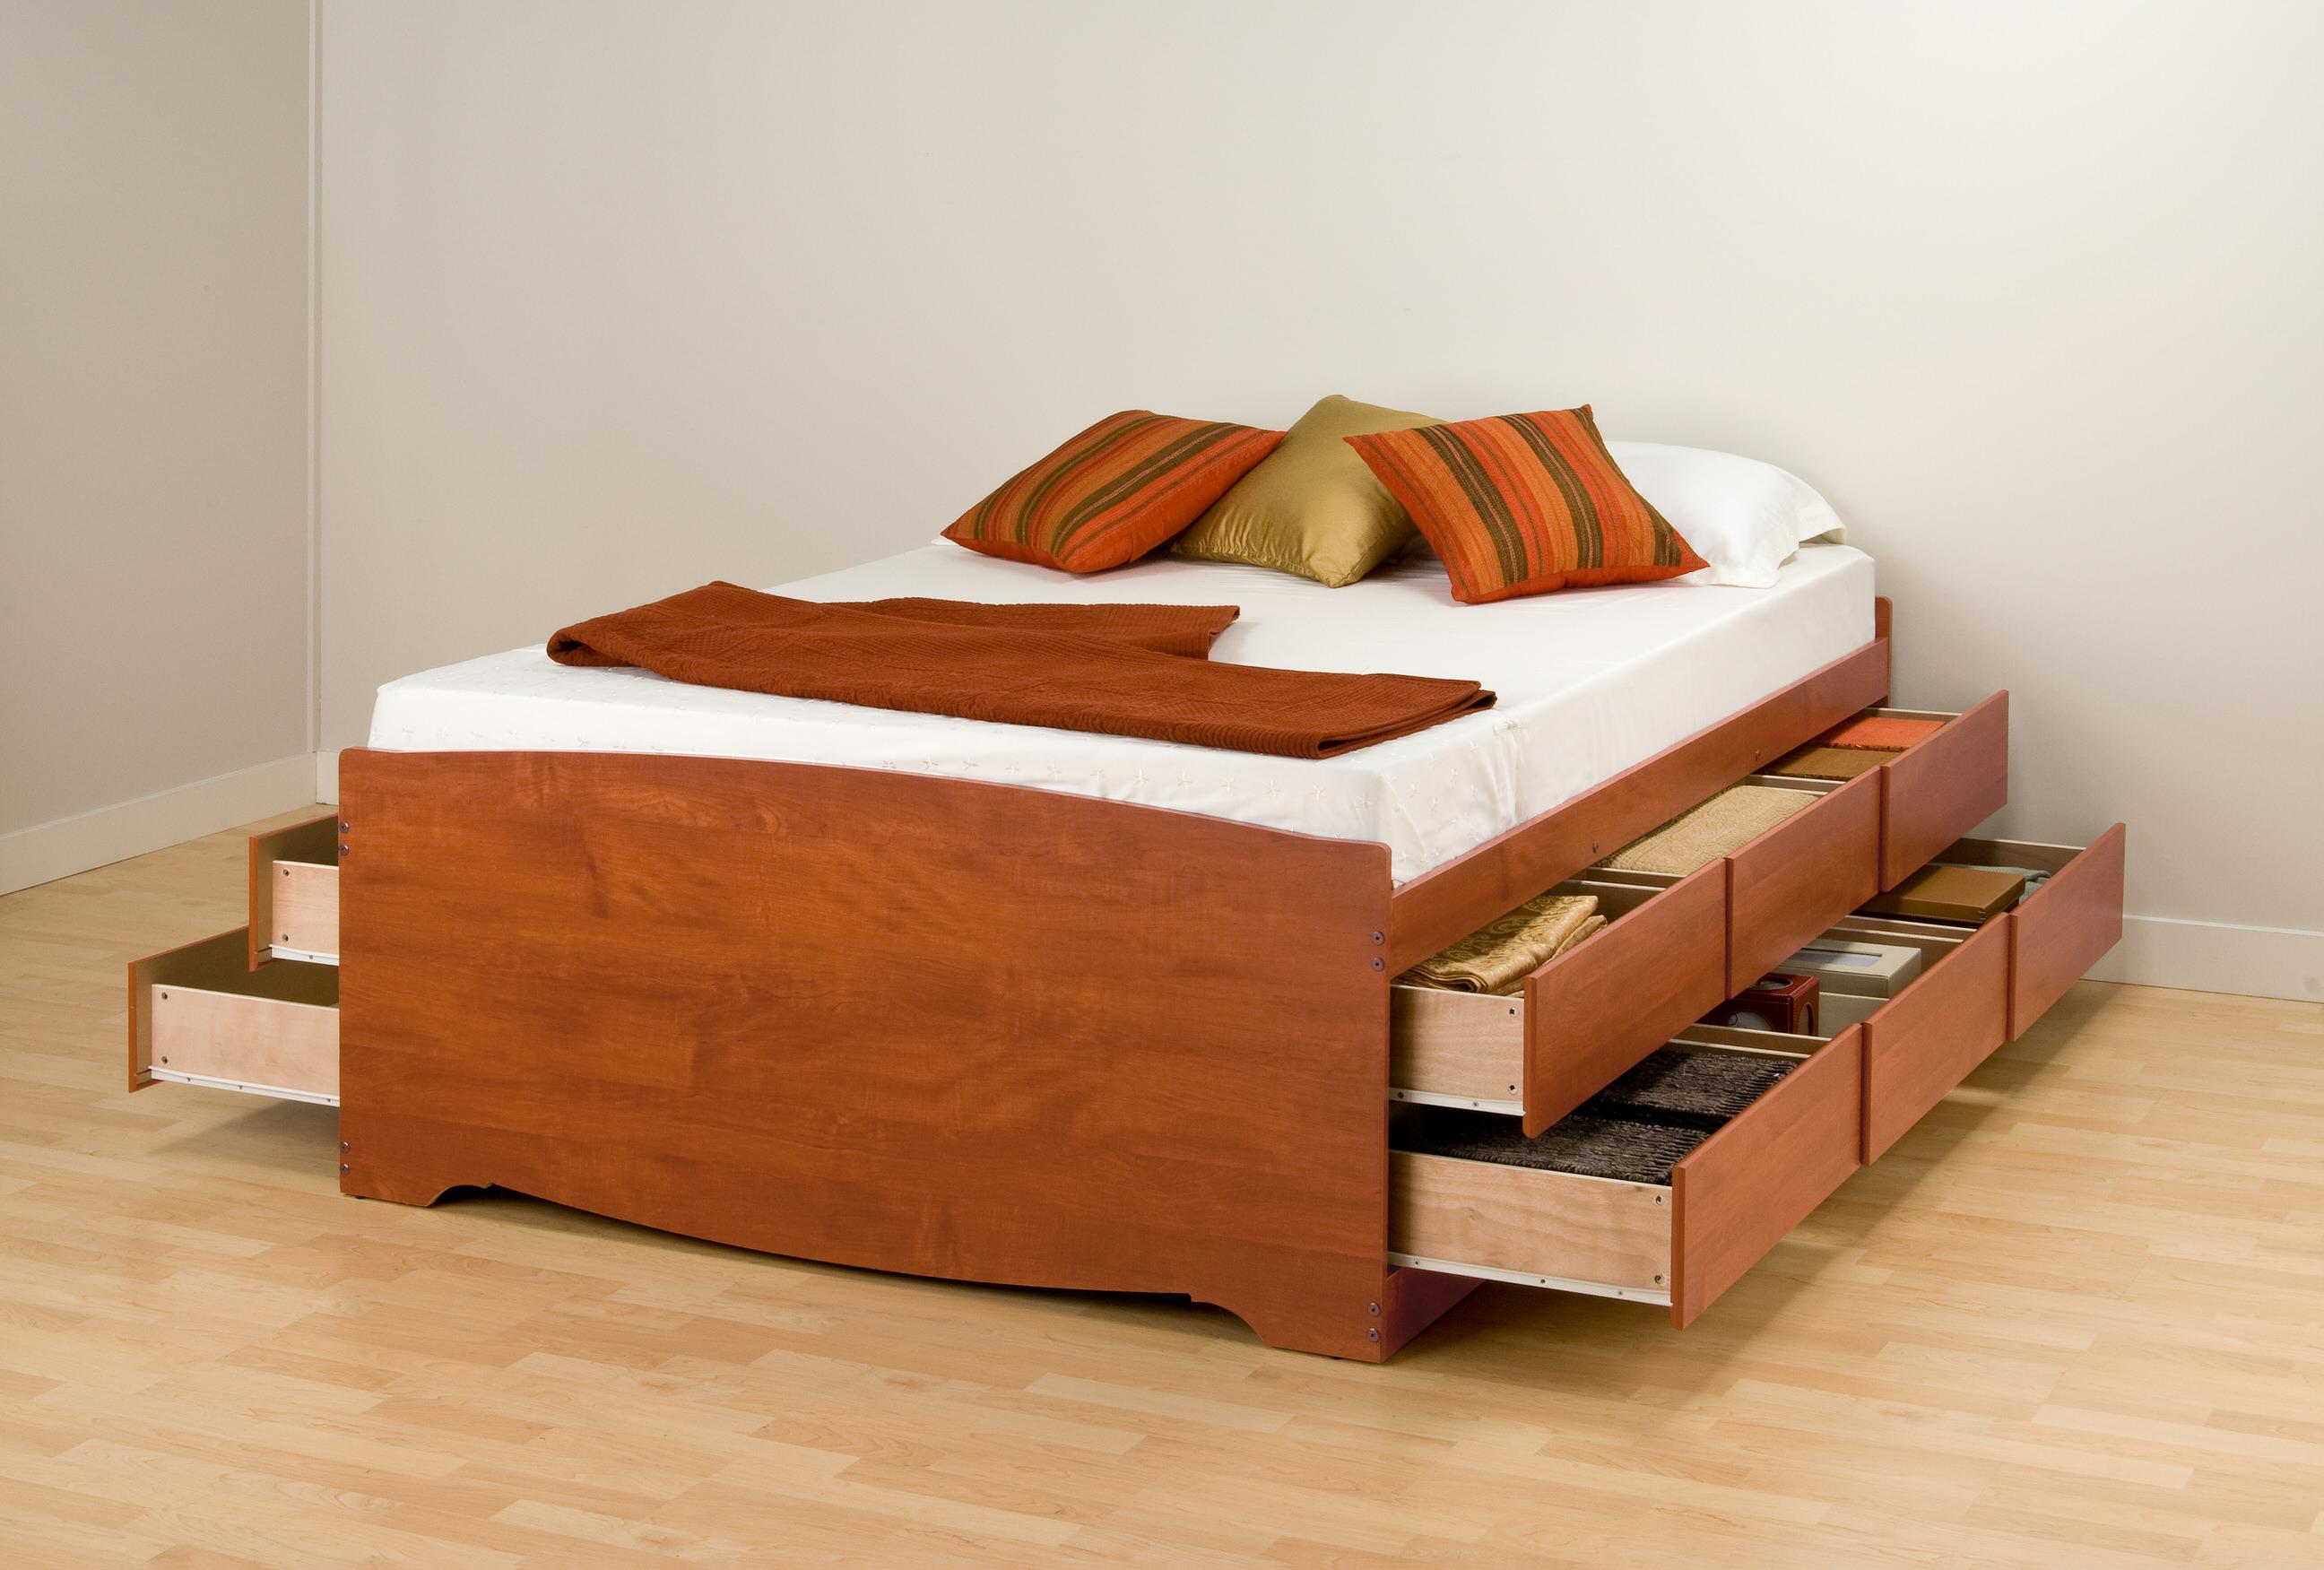 full tall platform storage bed 12 drawers by prepac cherry